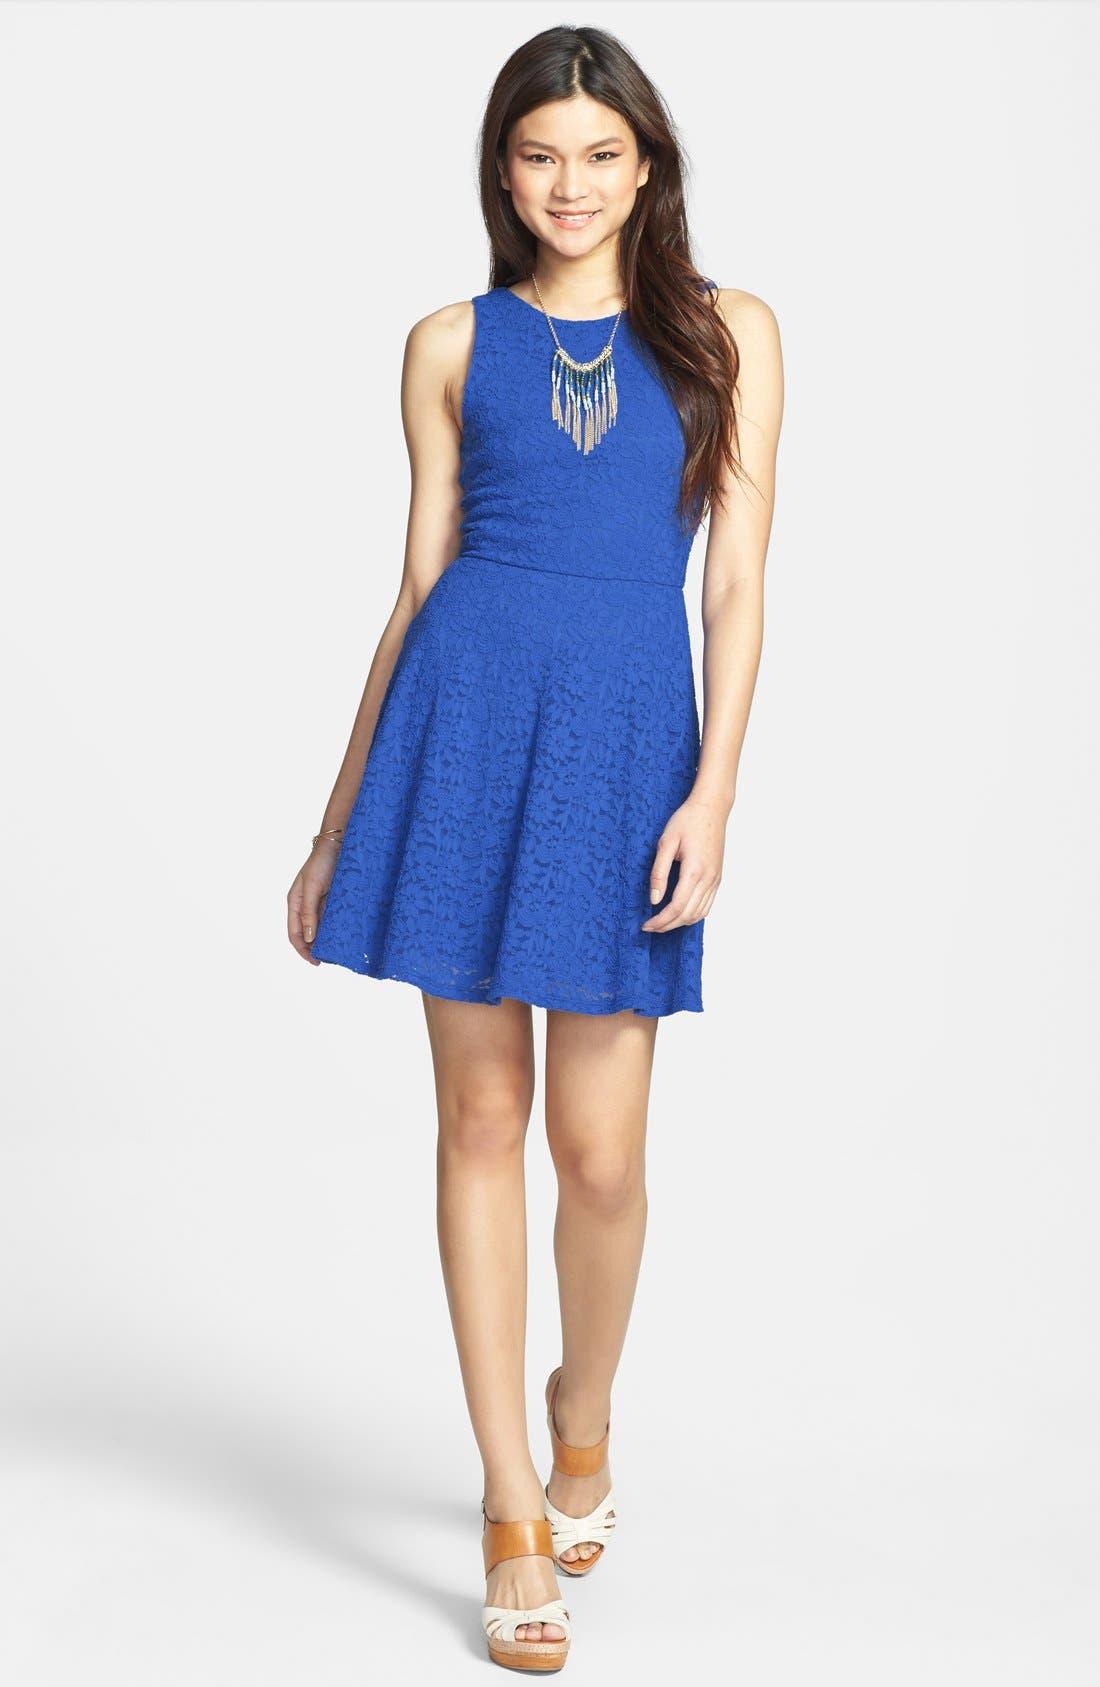 Alternate Image 1 Selected - Everly Lace Scoop Back Skater Dress (Juniors)